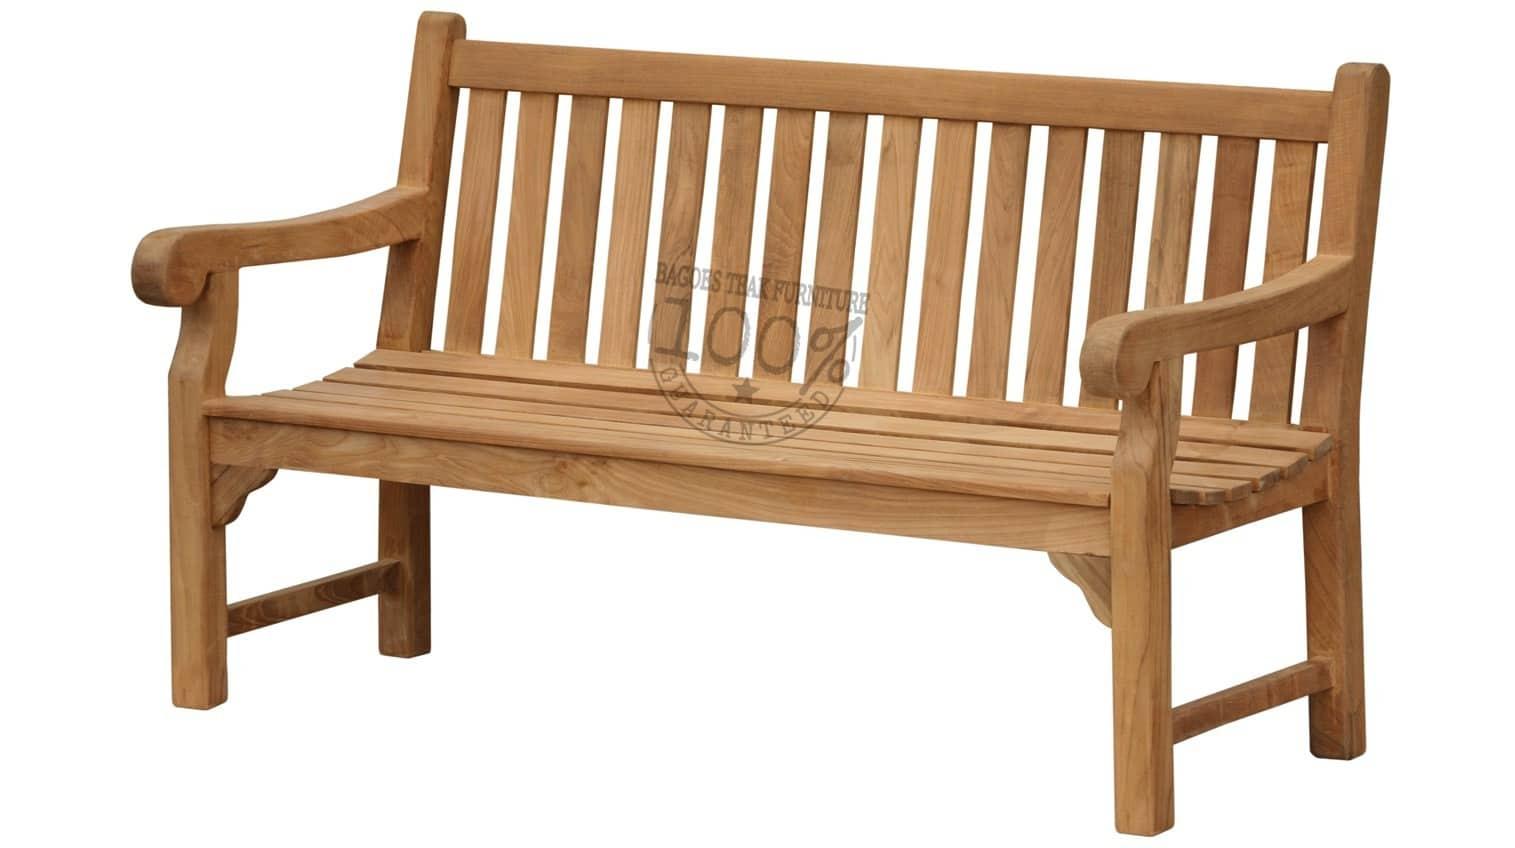 BEST Outdoor Teak Benches, Teak garden benches, patio teak benches ...